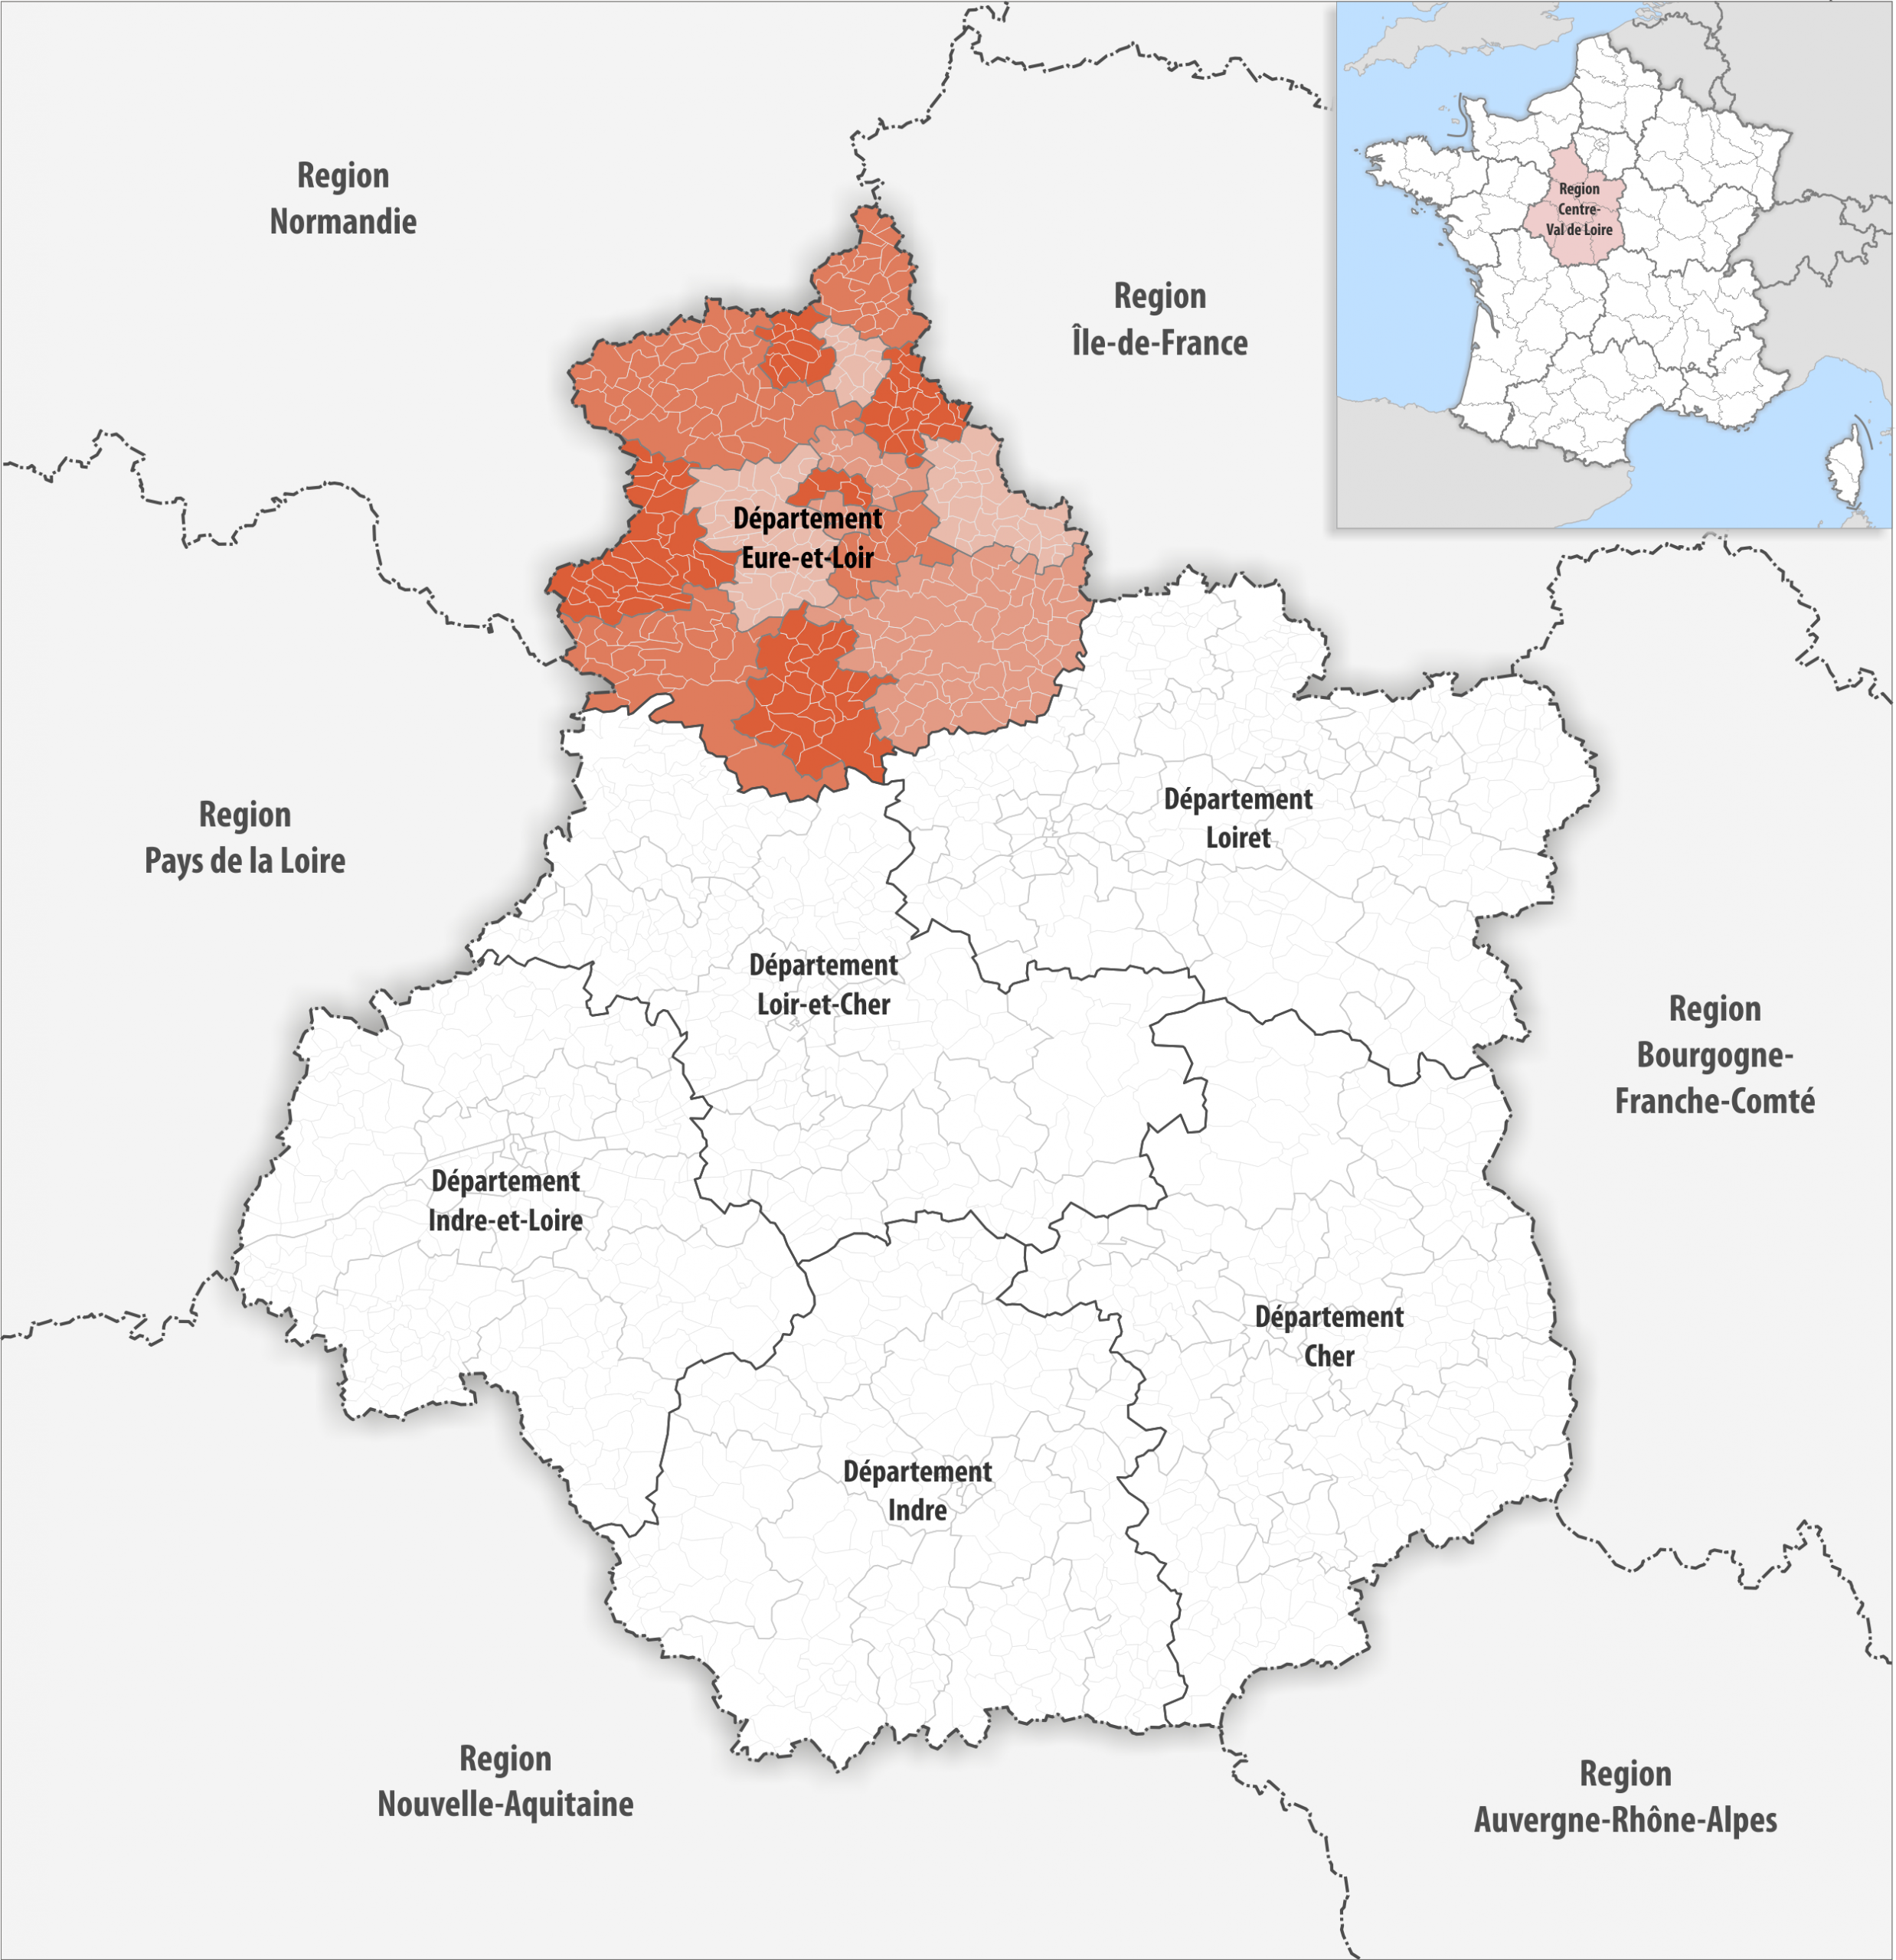 File:locator Map Of Departement Eure-Et-Loir 2018 concernant Departement 22 Region